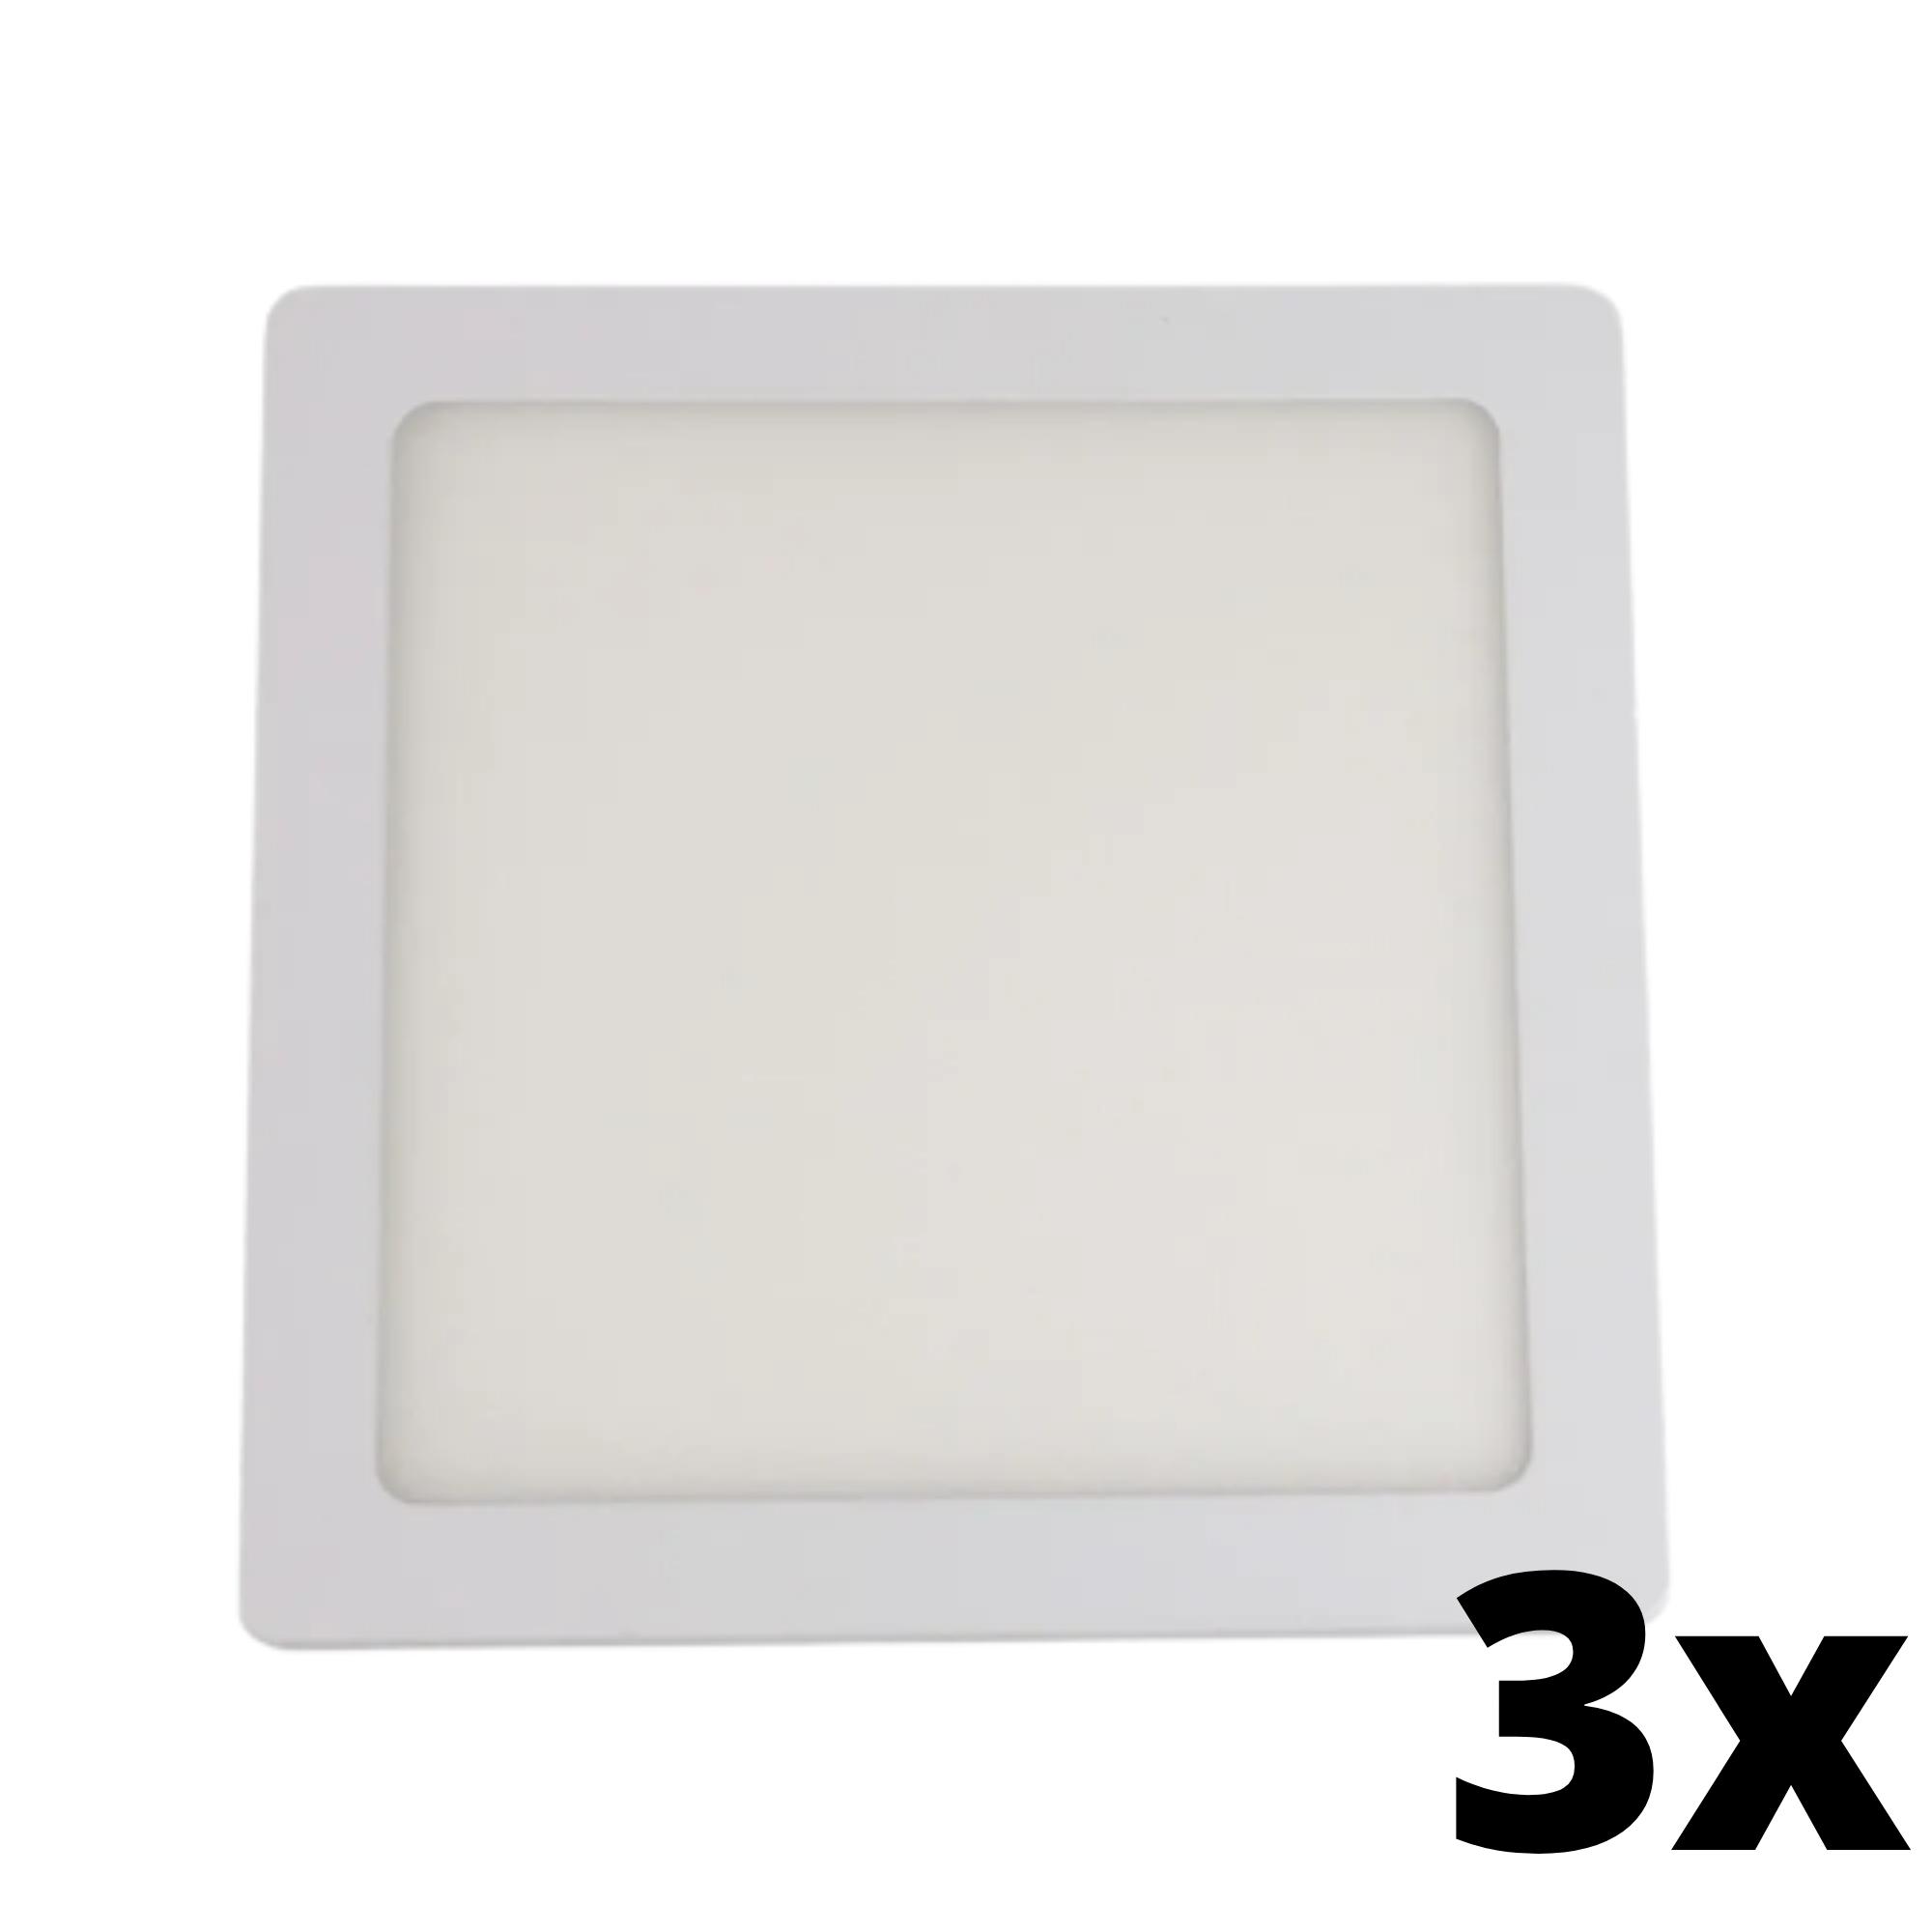 Kit 3 und Painel de Led Embutir 12w Quadrado 6500k